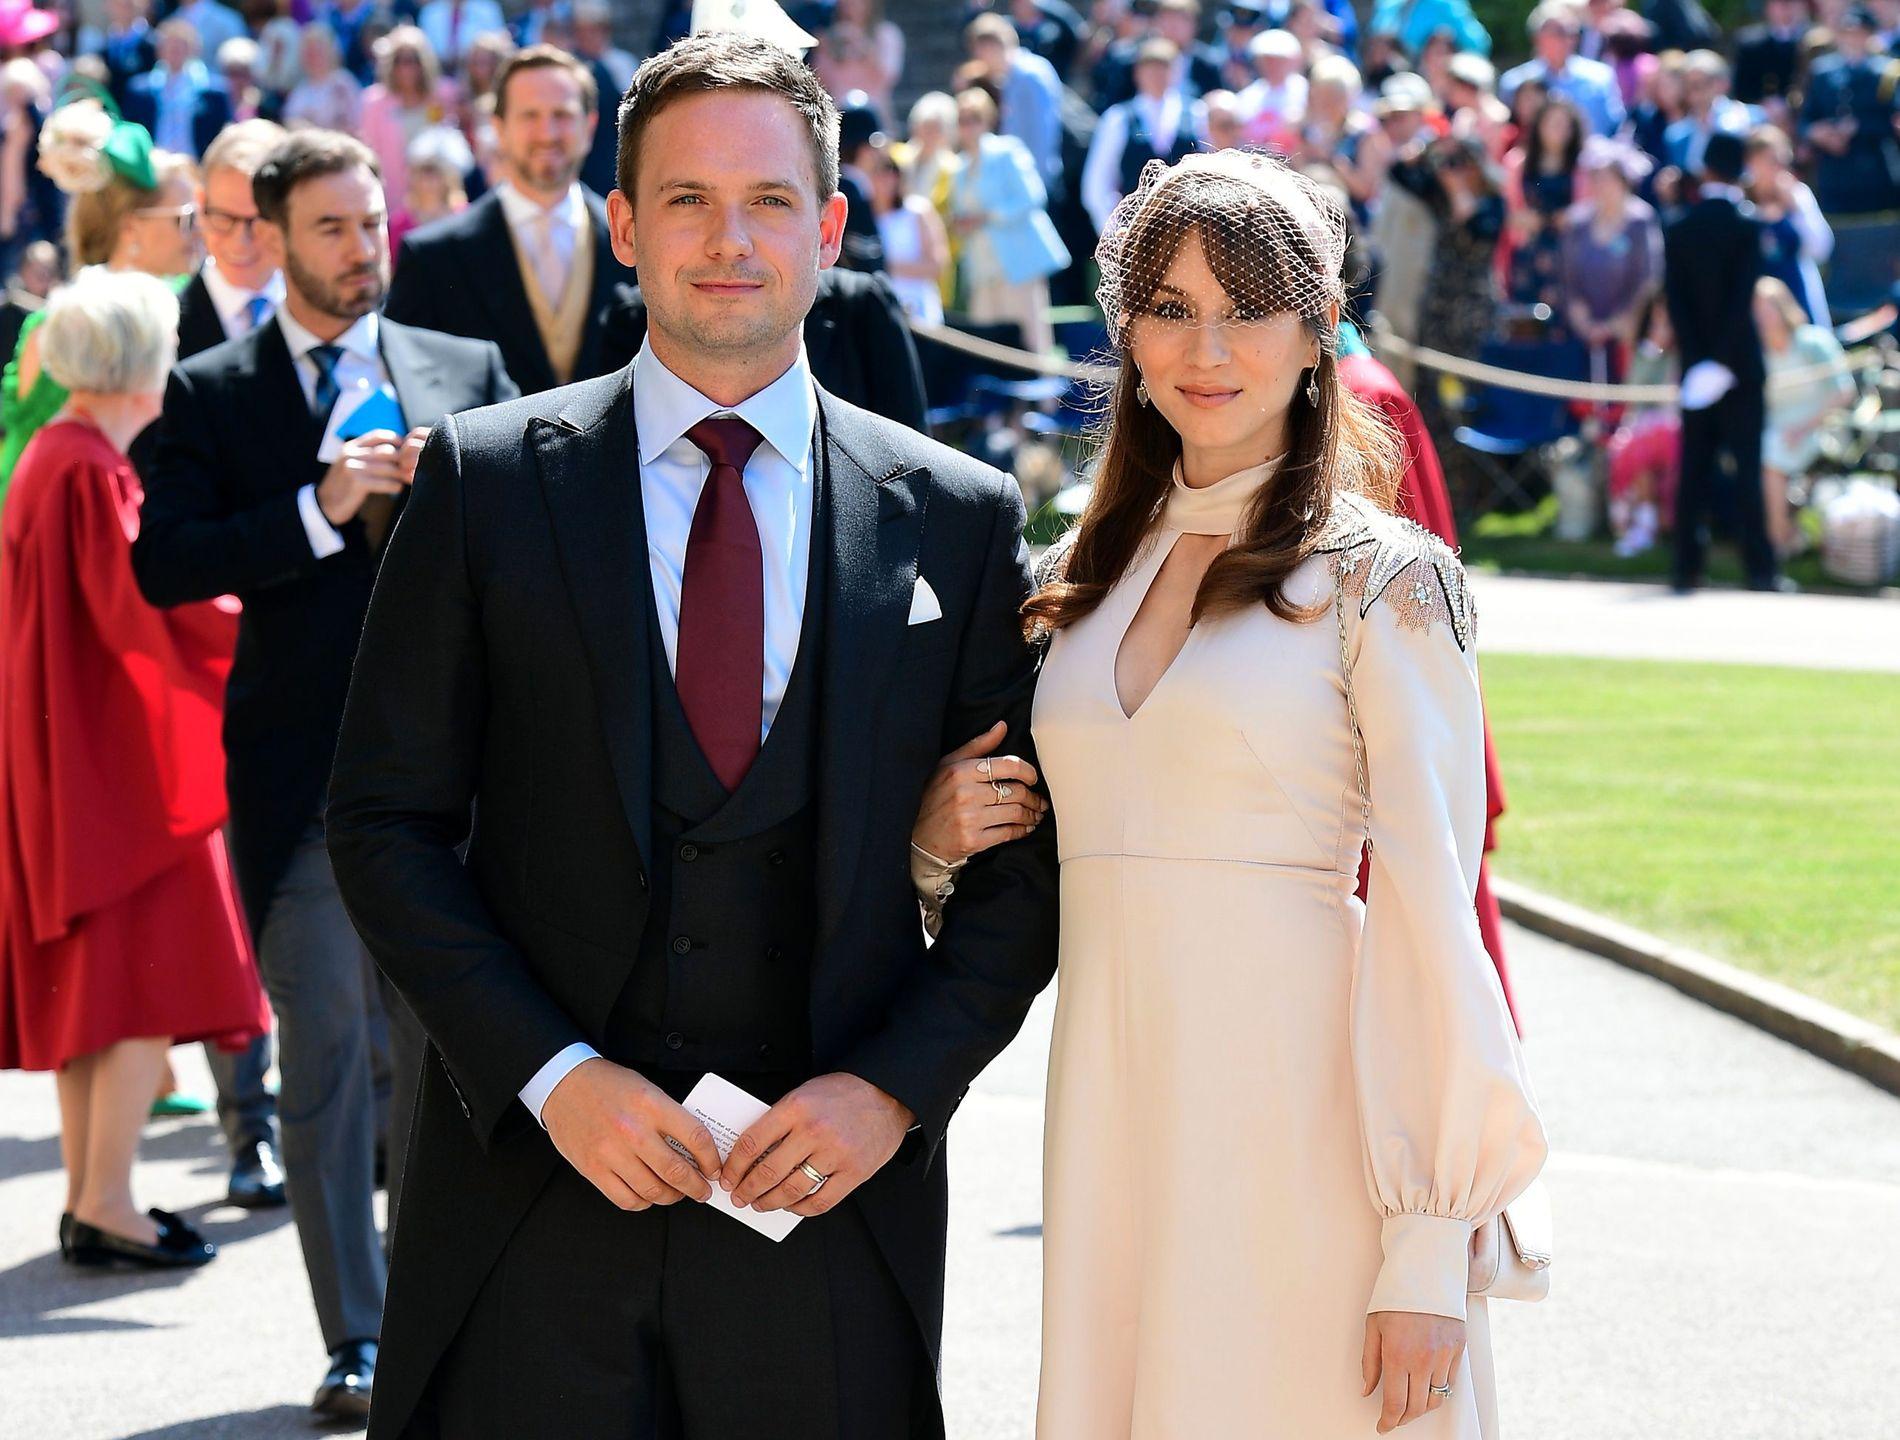 PRINSEBRYLLUP: Patrick J. Adams og Troian Bellisario var til stede da Meghan Markle giftet seg med prins Harry.